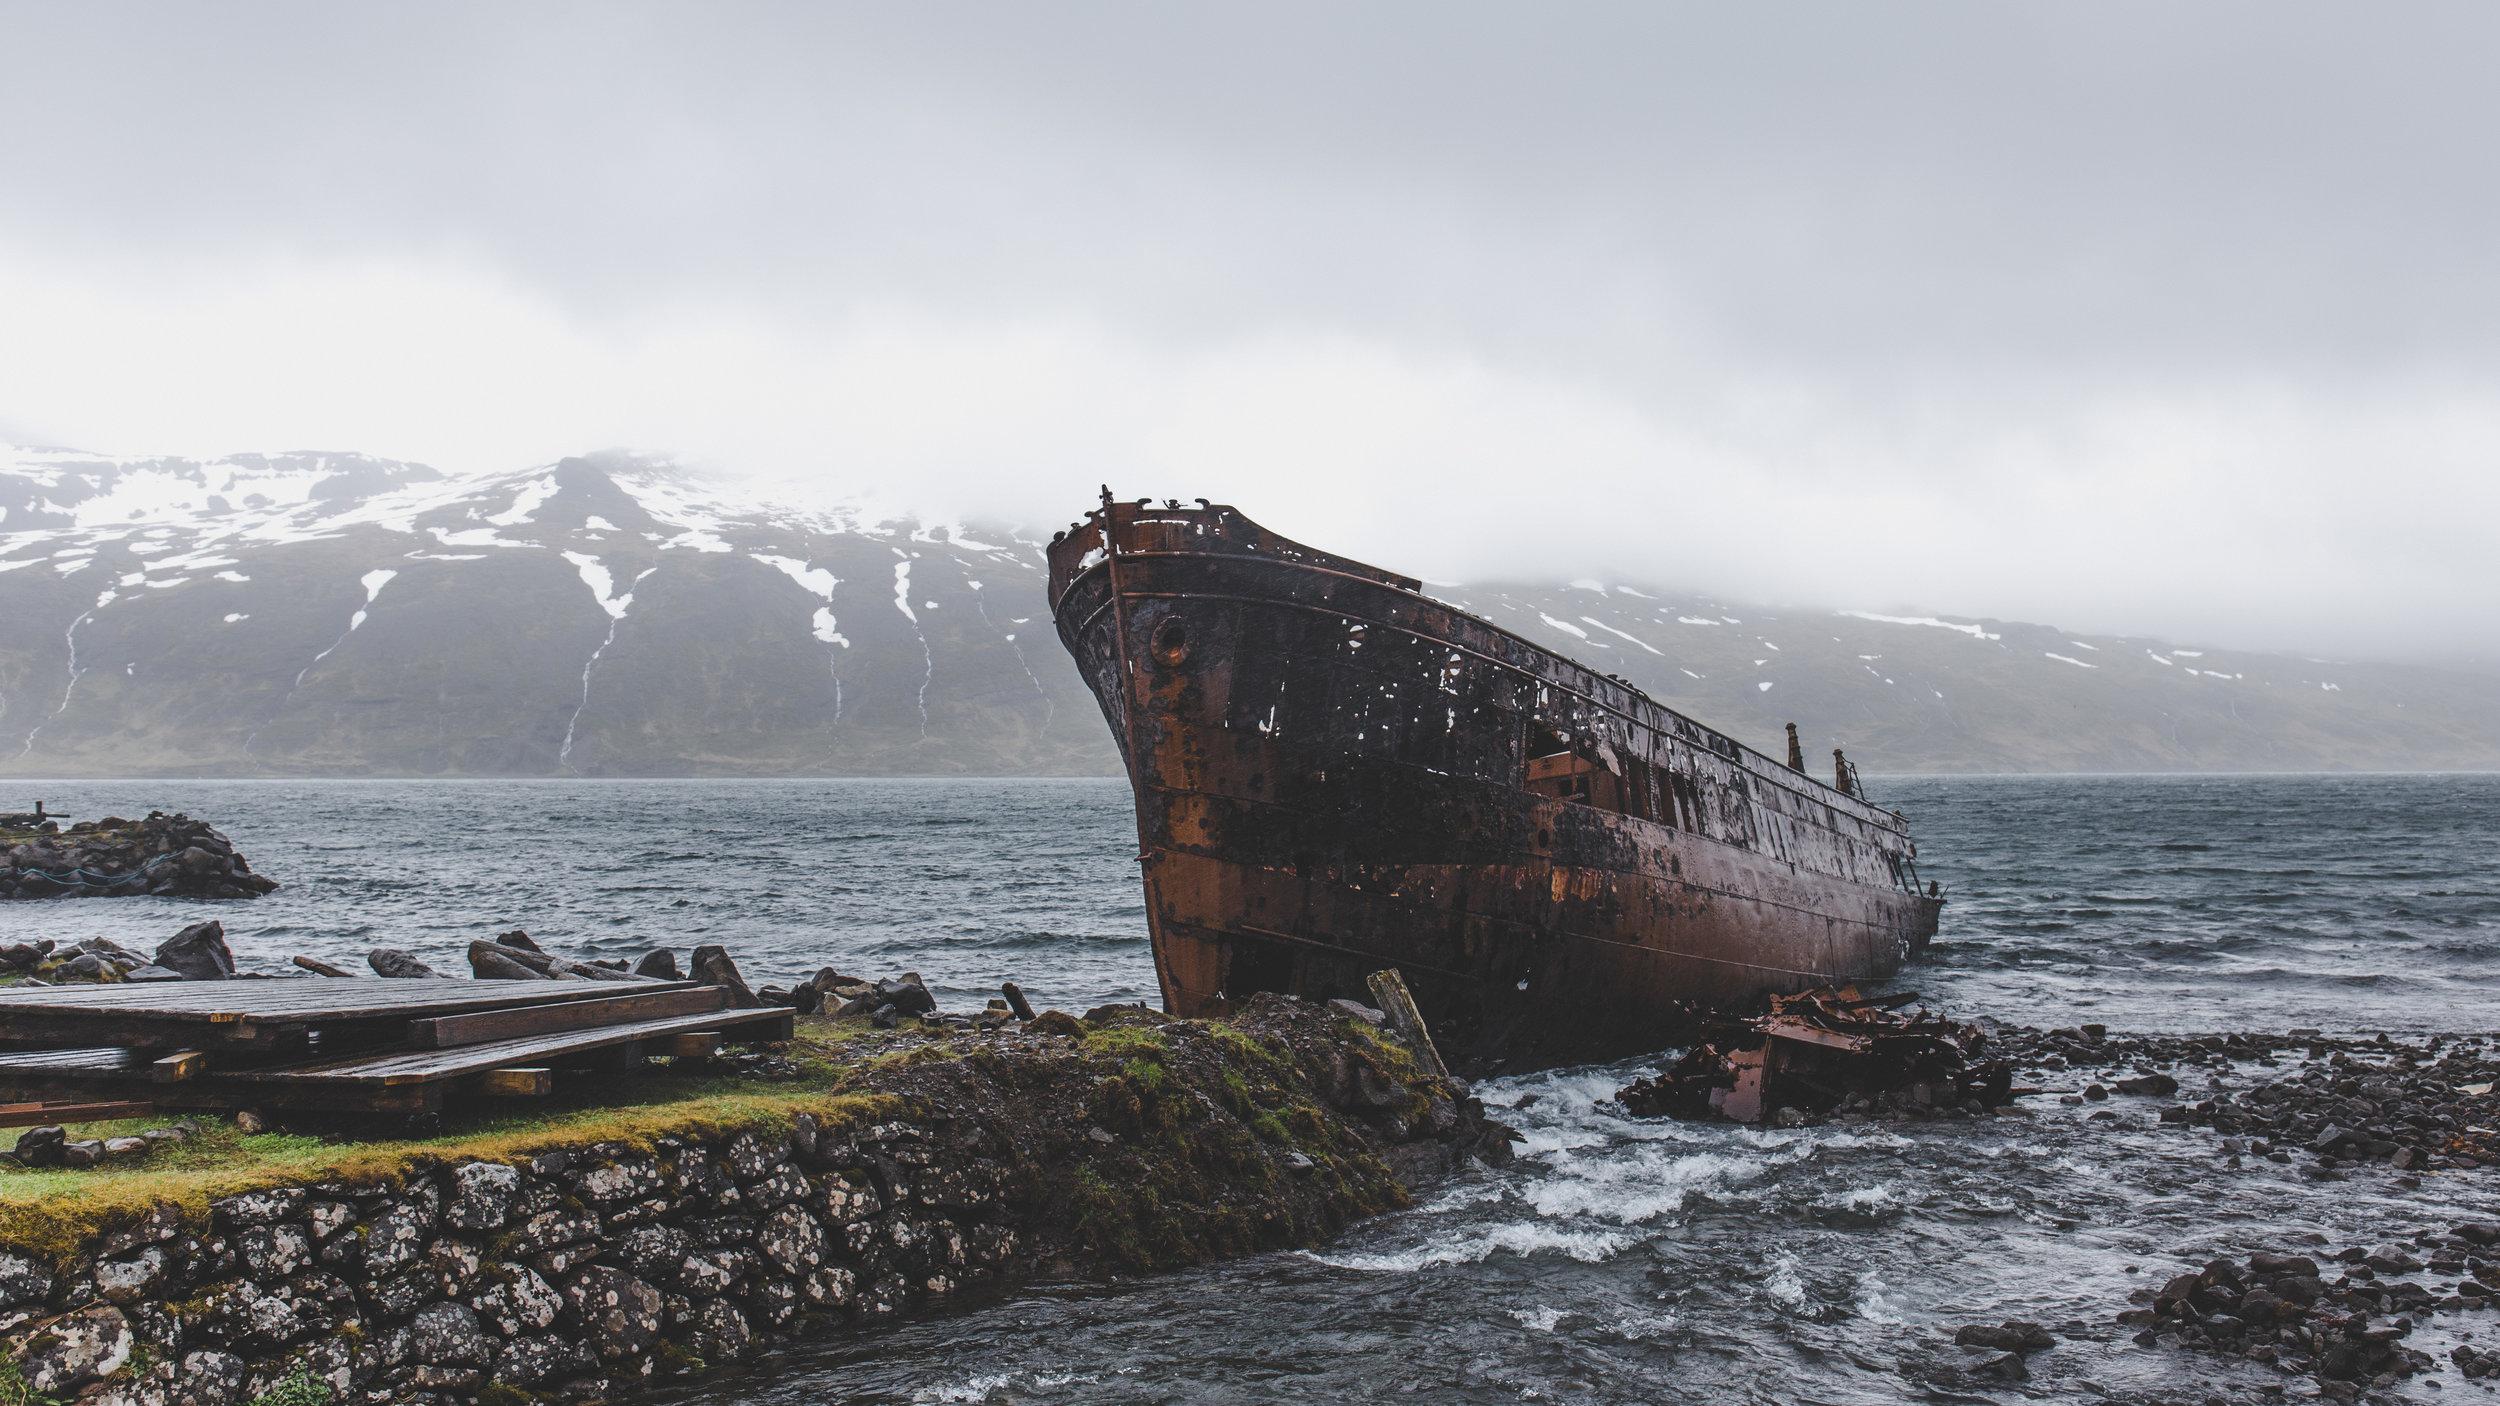 Deserted ship enroute Strandir Coast